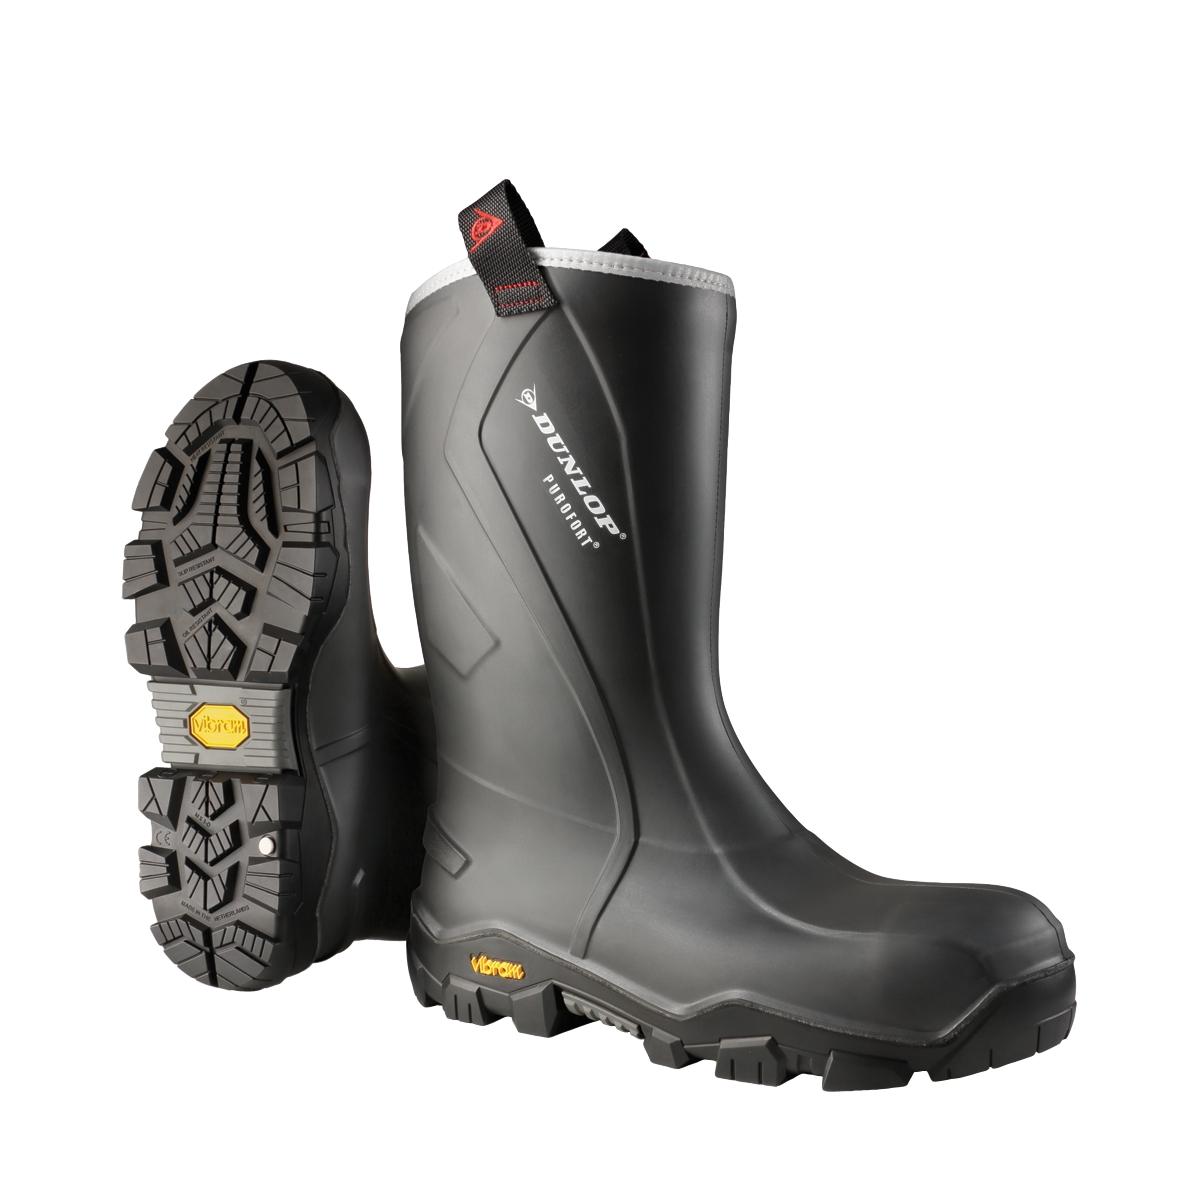 Bottes Purofort+ Reliance Full Safety CC22A33.CH - Anthracite/Noir Dunlop